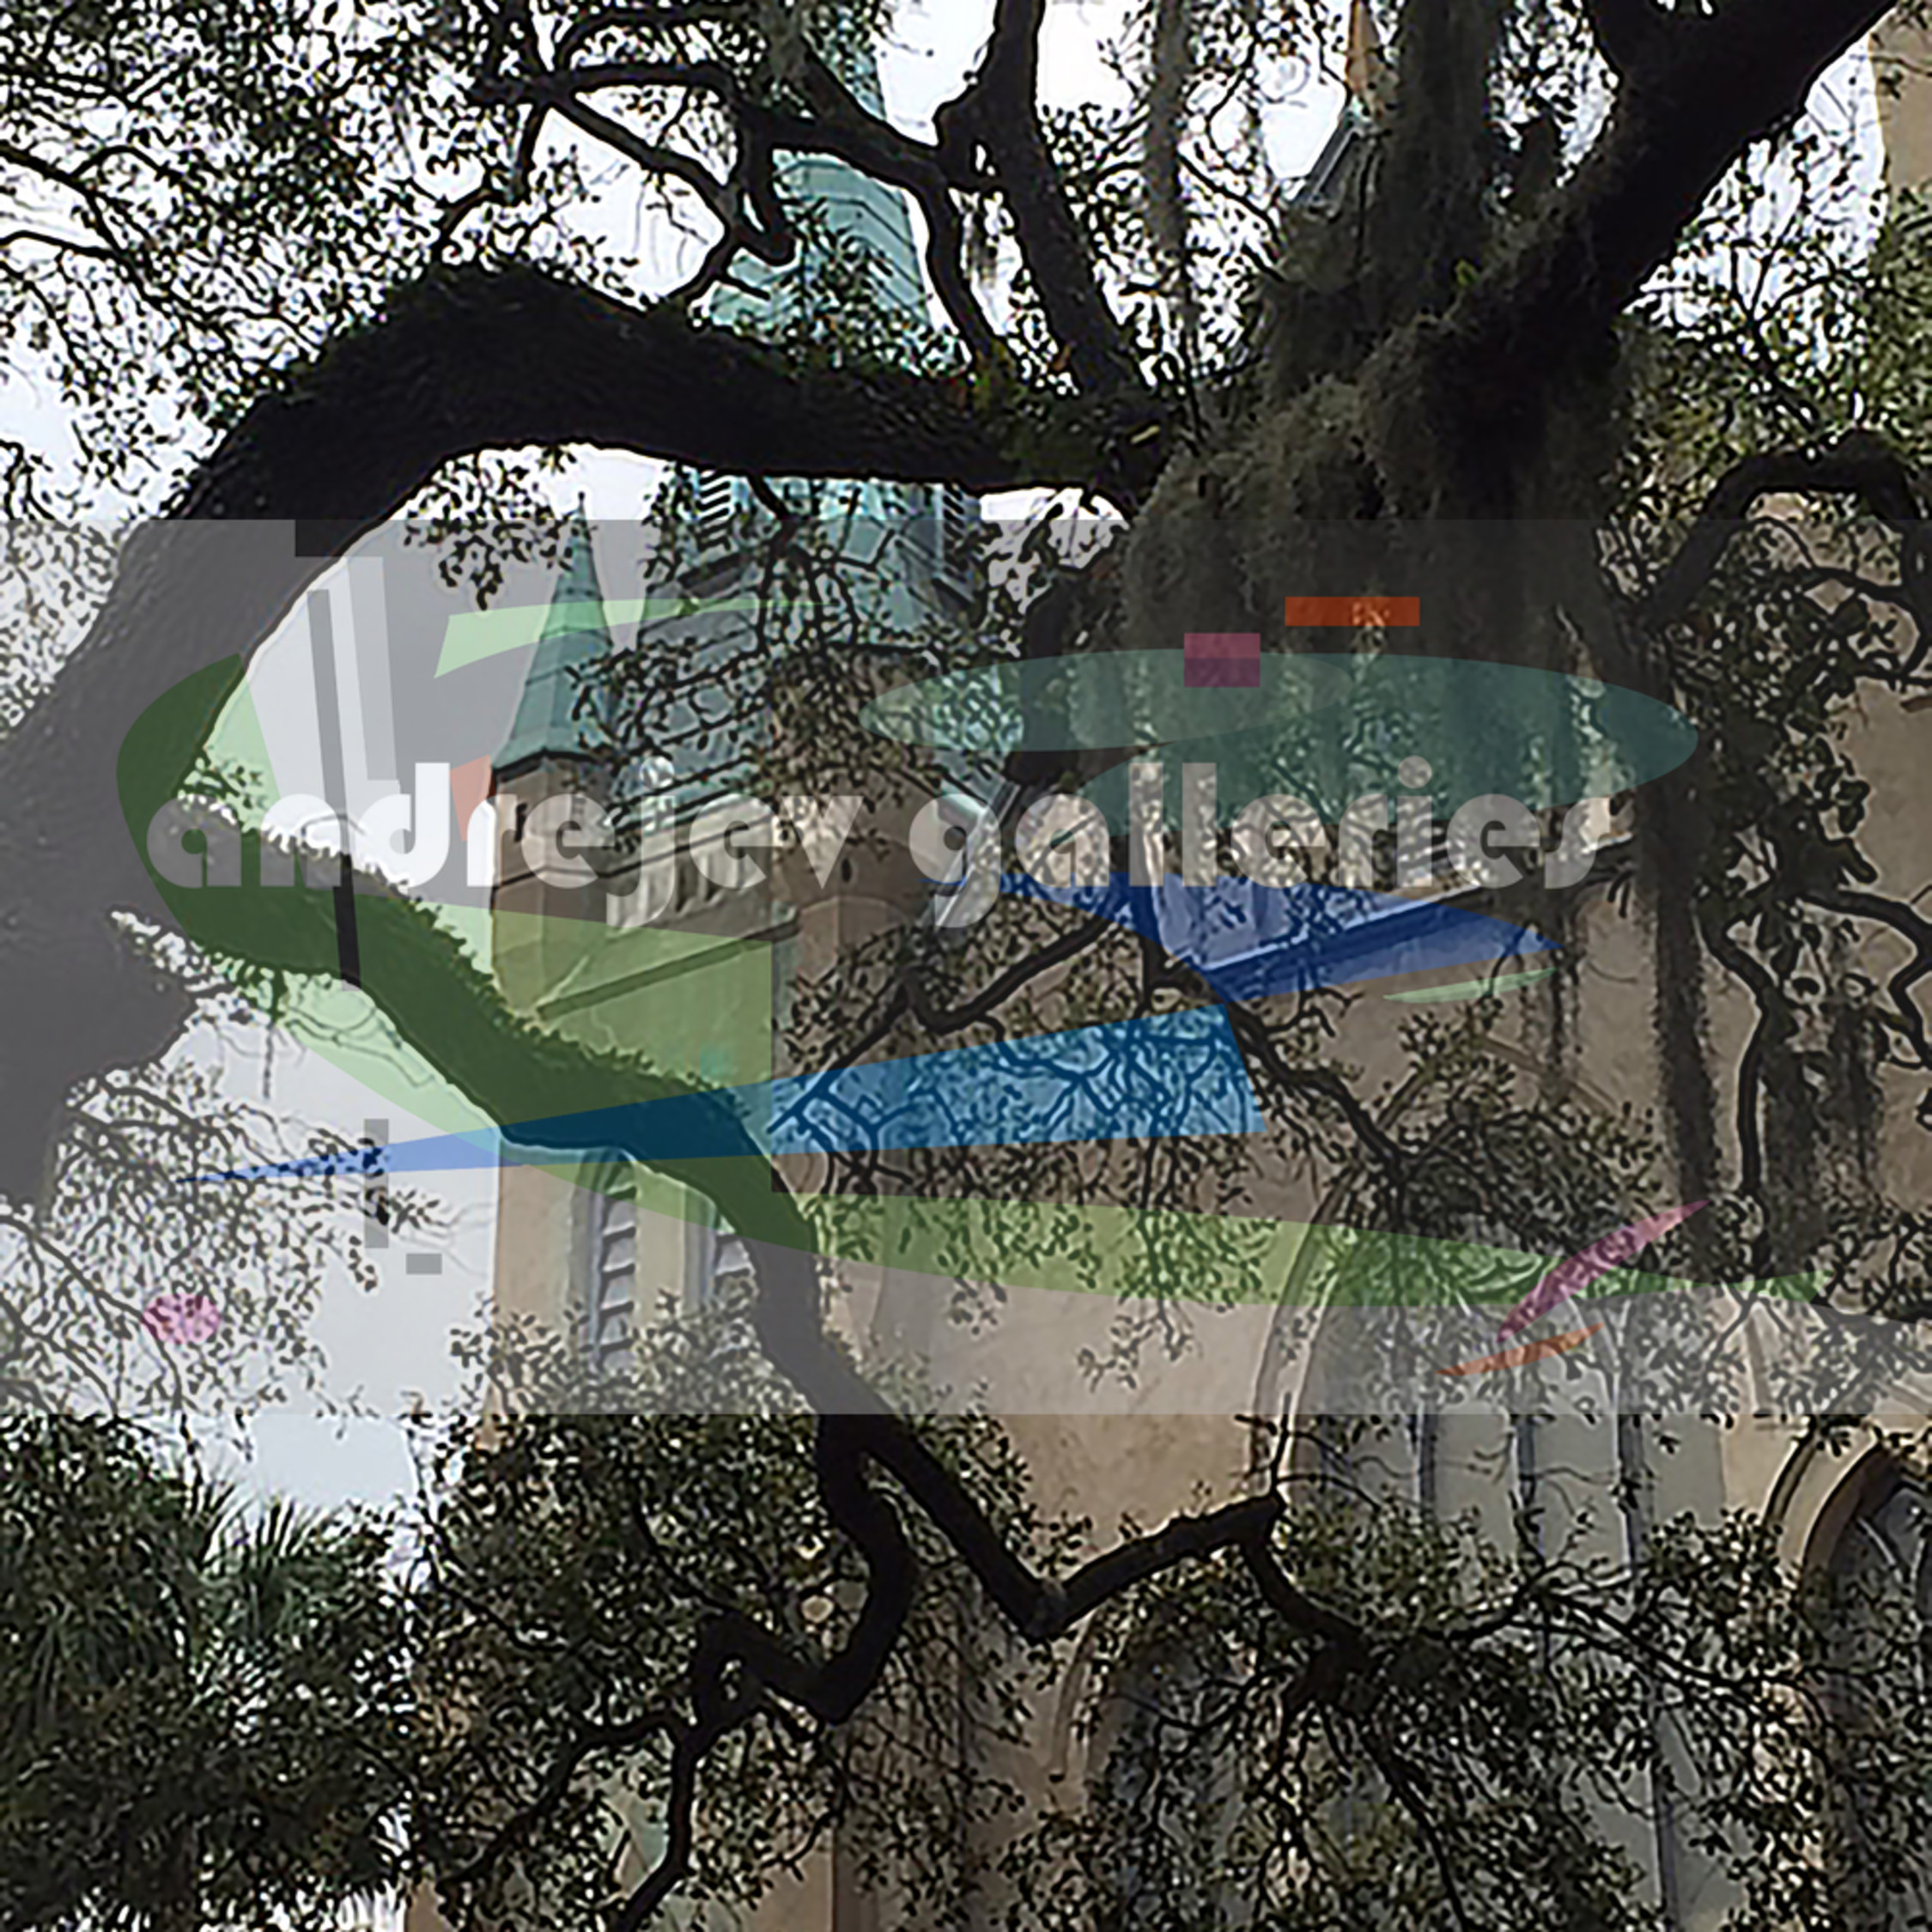 Church w mossy trees 8 by10 300dpi zb5ckb